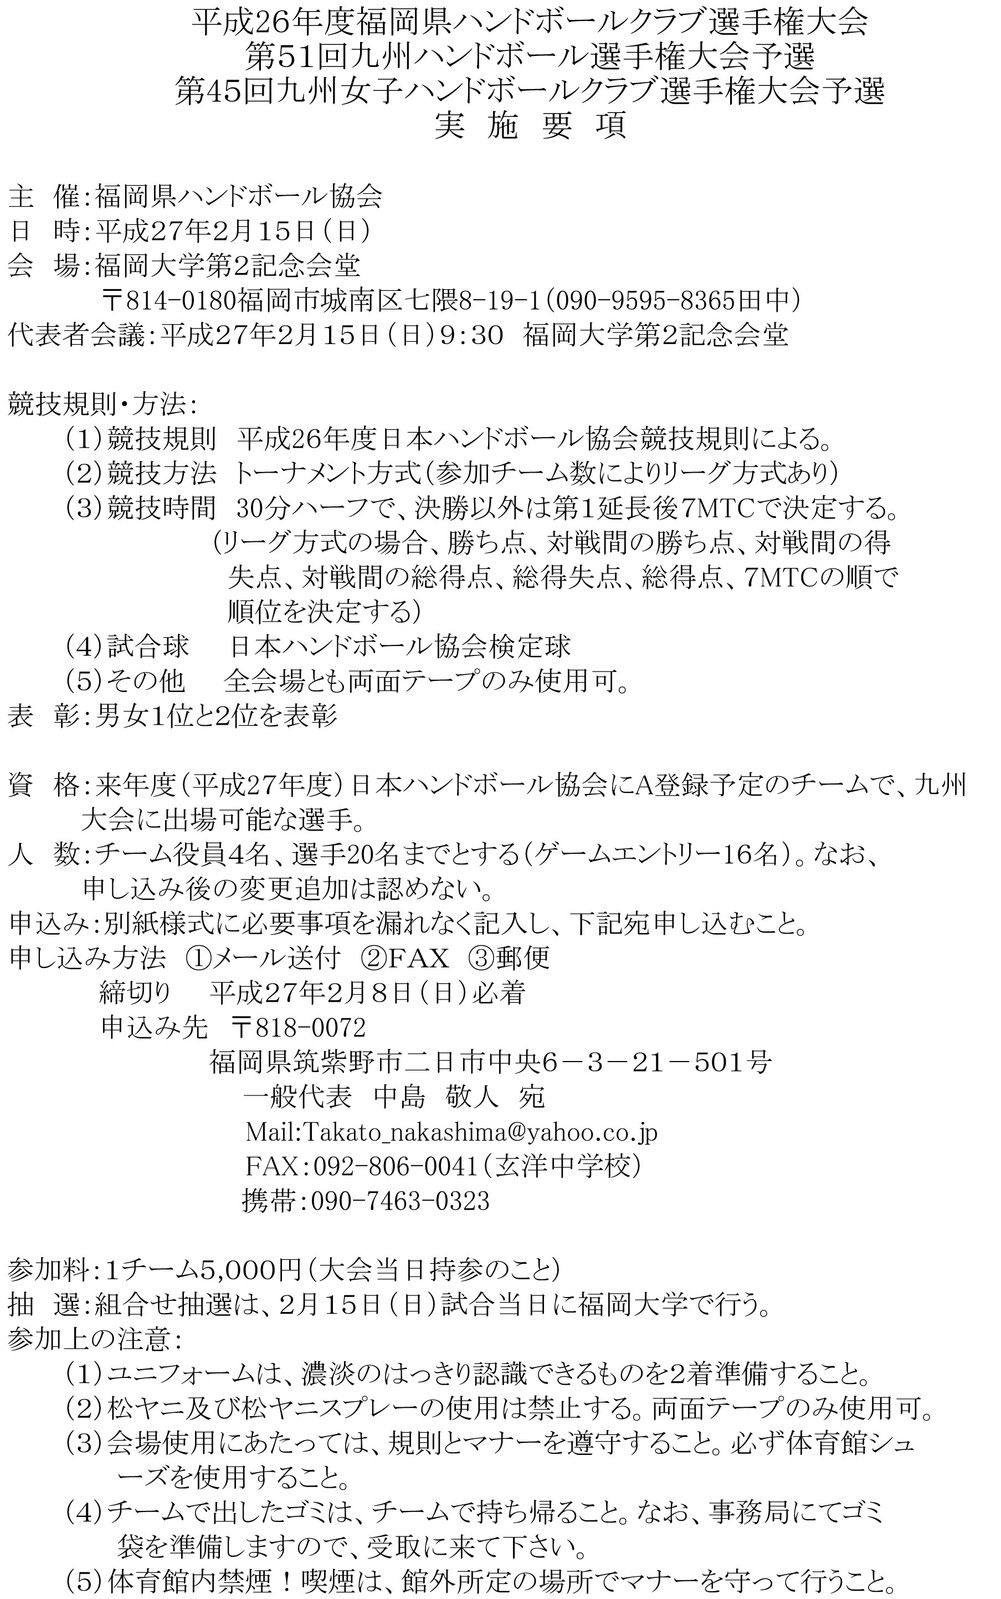 2014ipan_clb_sennsyuken_youkou